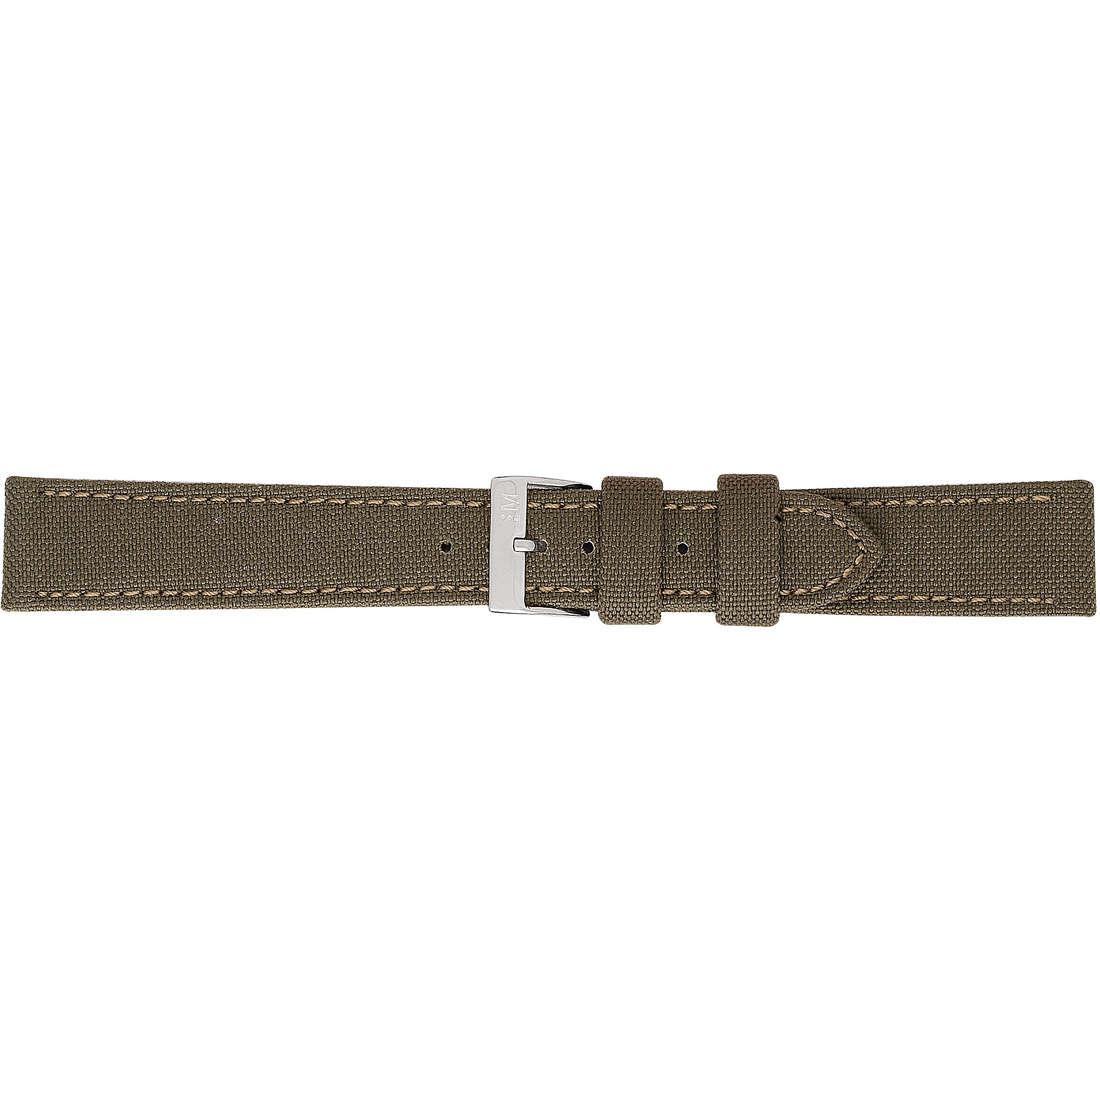 watch watch bands watch straps man Morellato Linea Sport A01U2779110072CR18